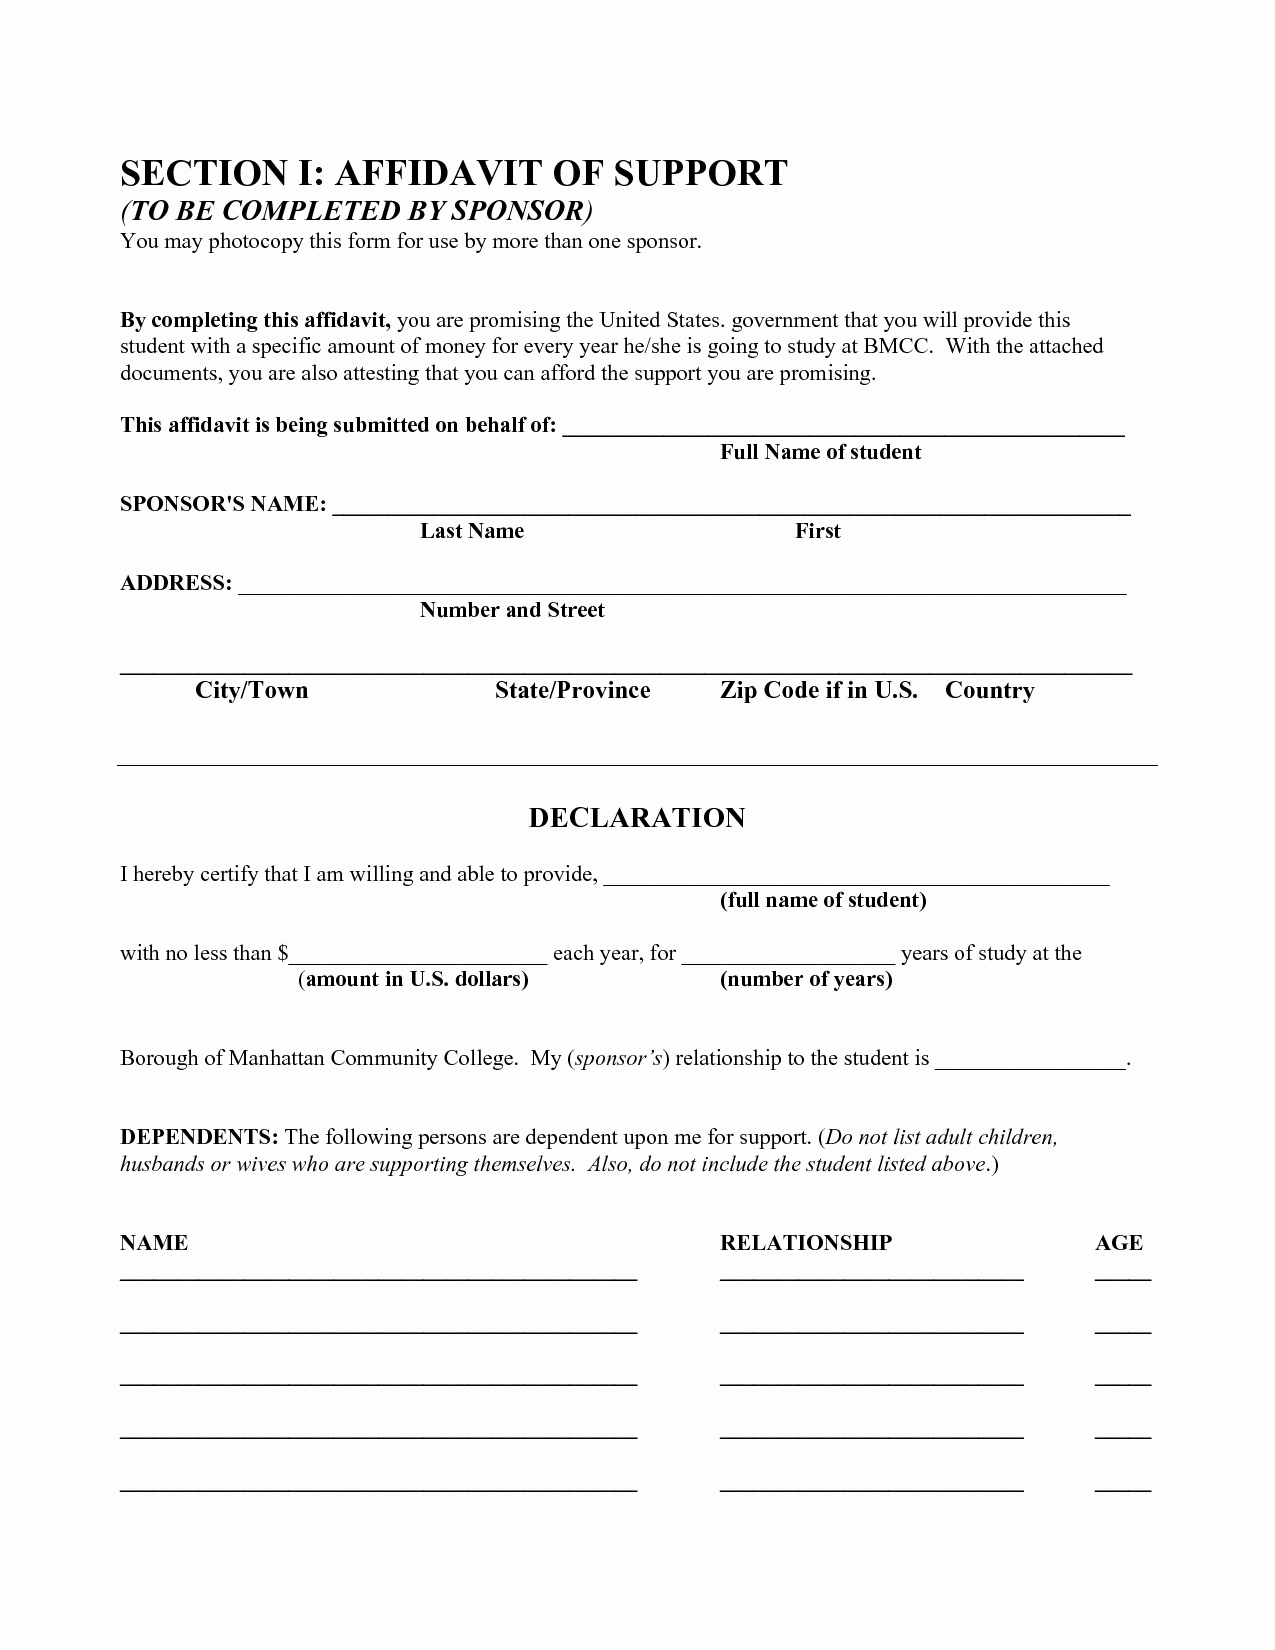 General Affidavit Template Word New Best S General Affidavit Template Free Printable